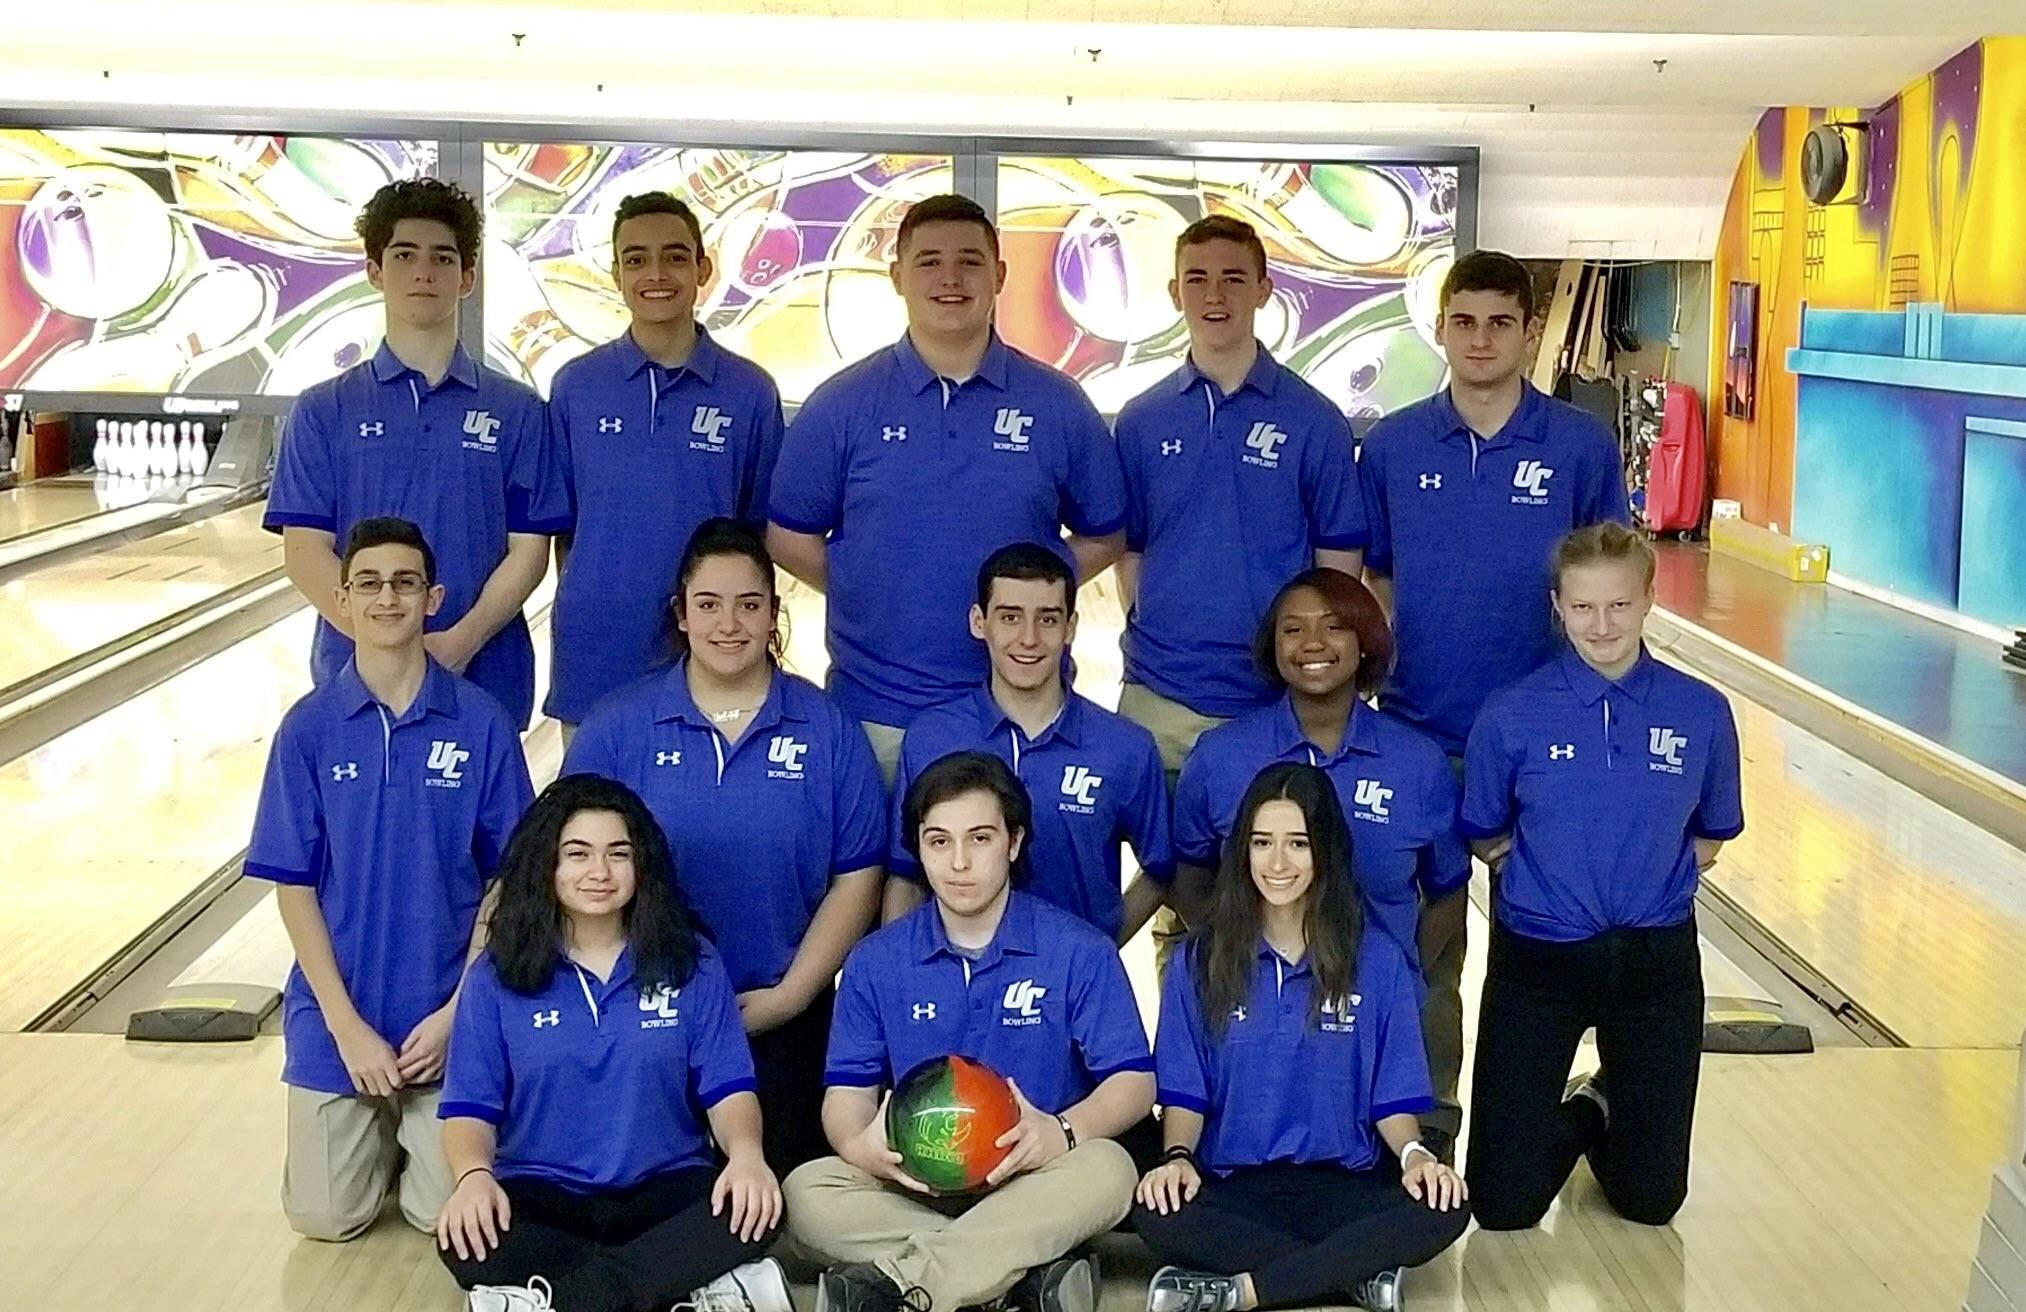 bowling team 2019.jpg